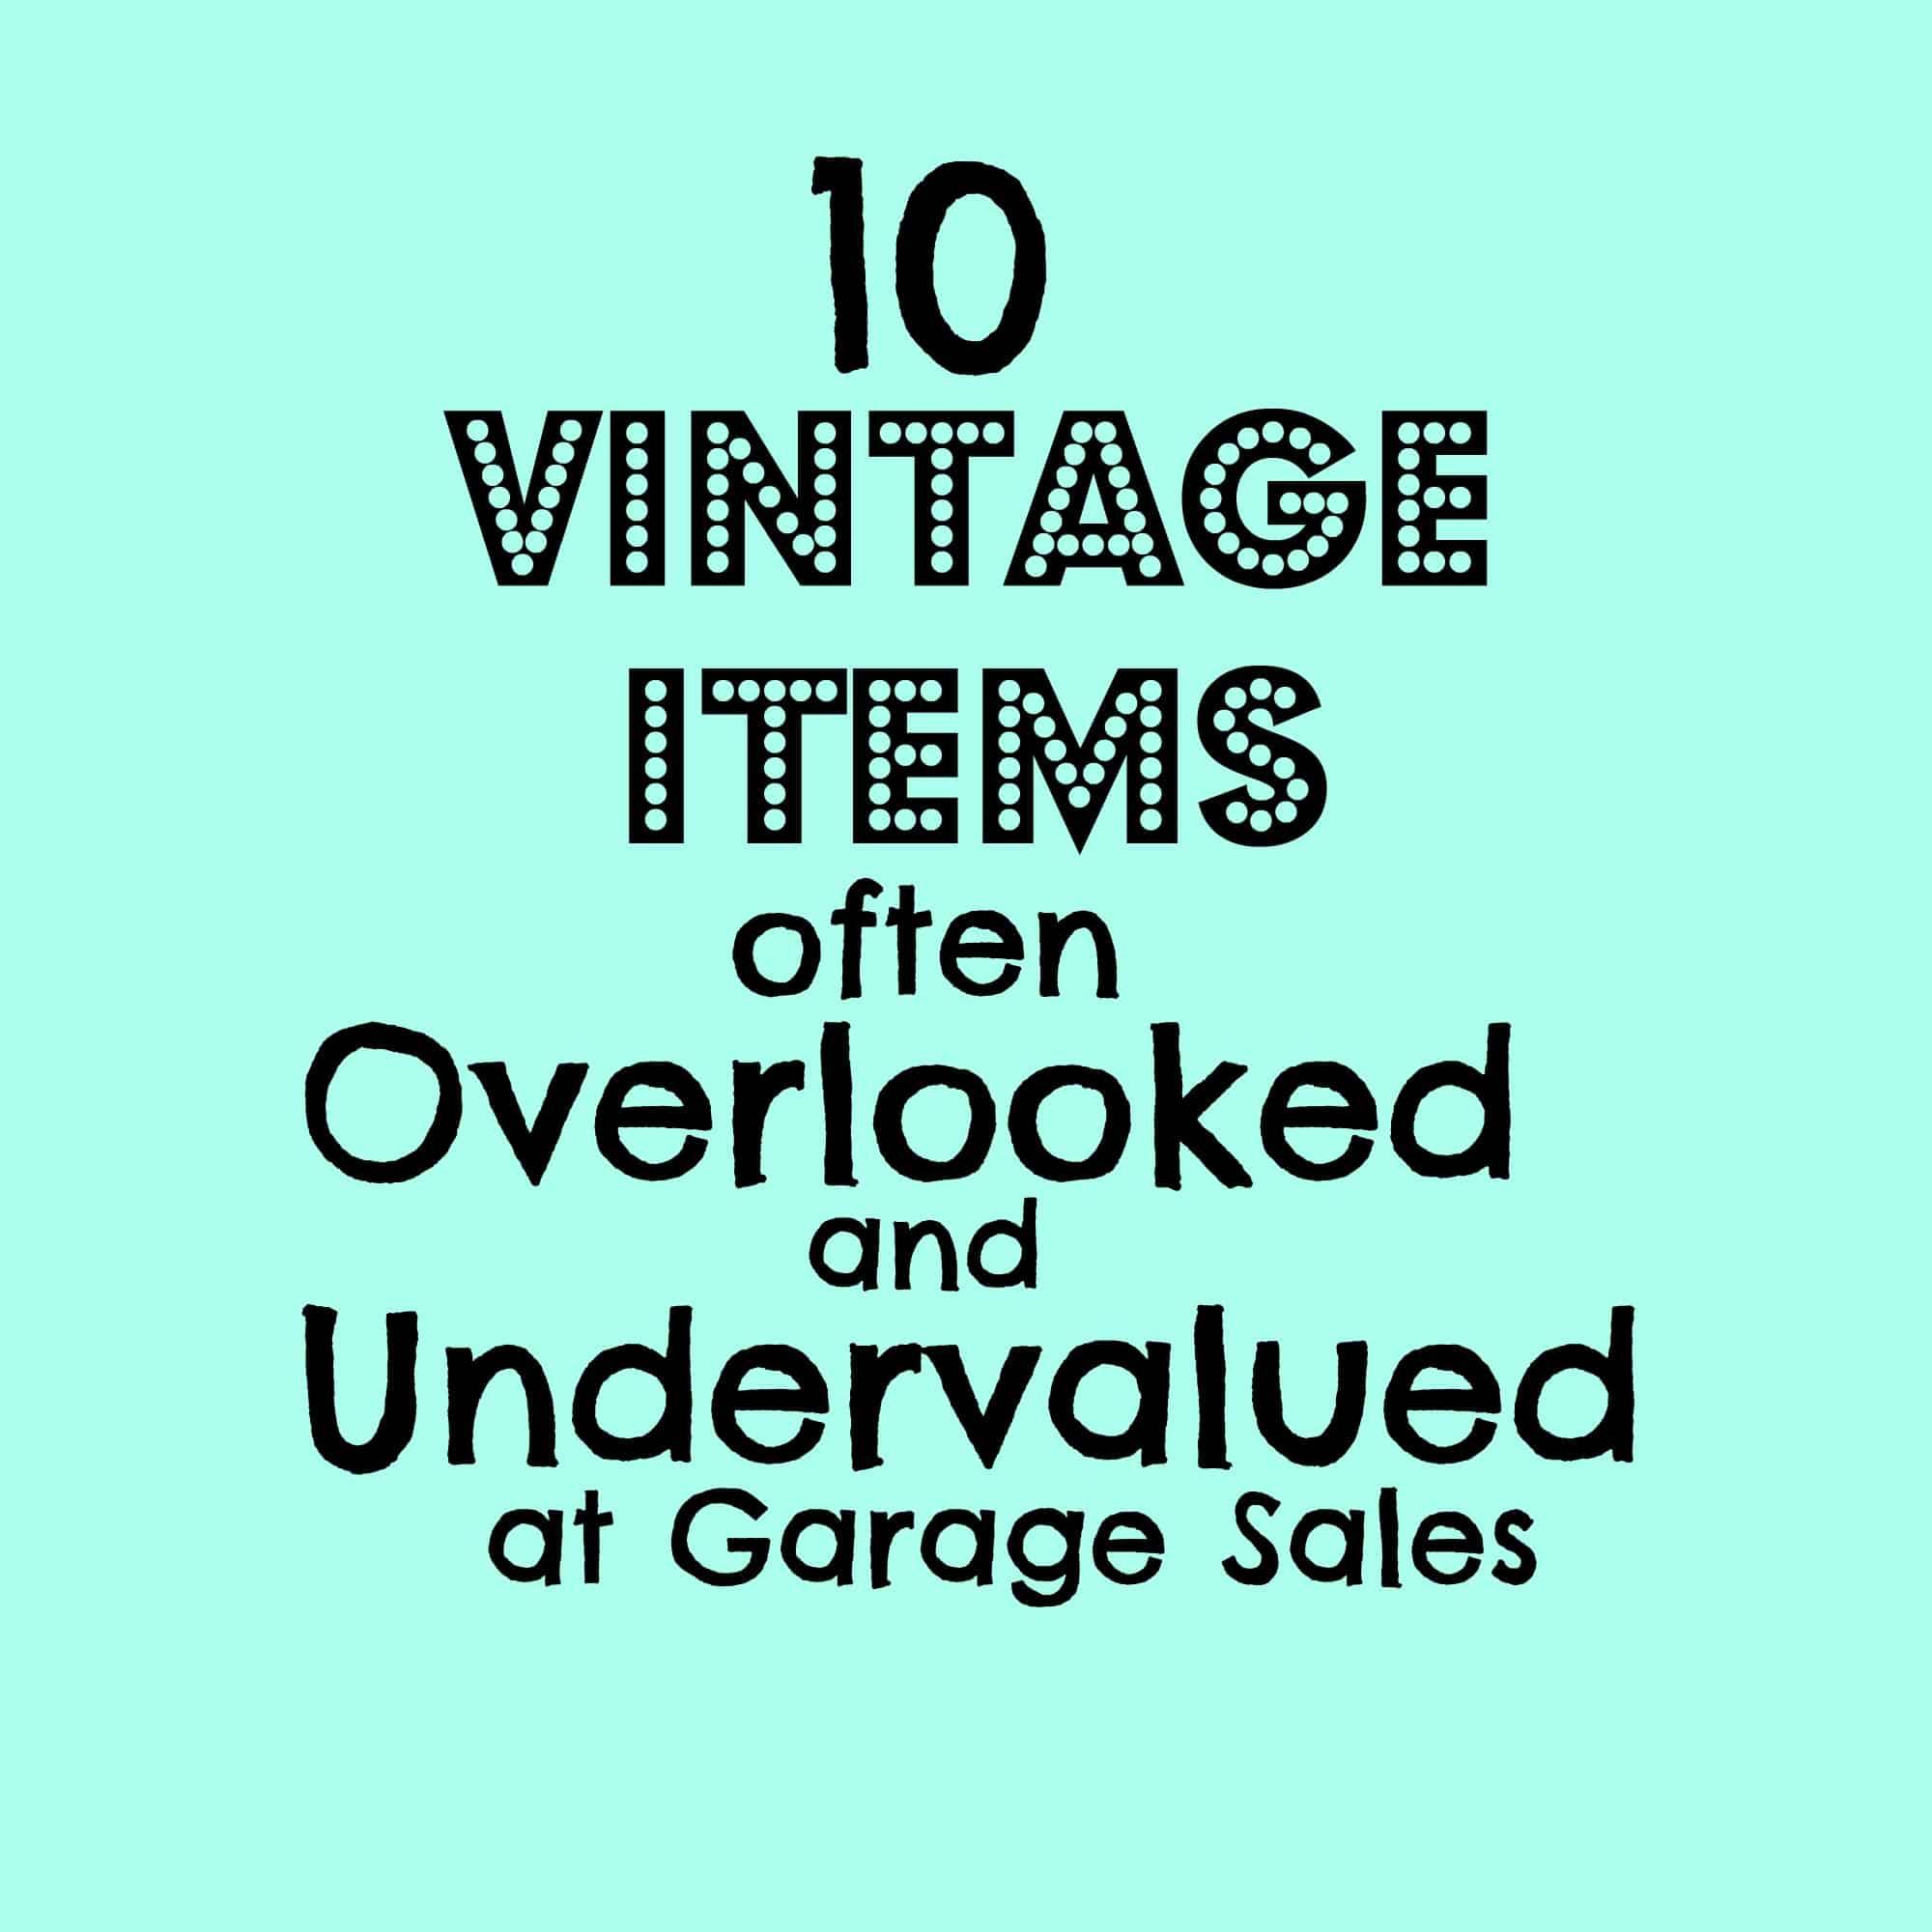 10 Vintage Items Often Overlooked Undervalued At Garage